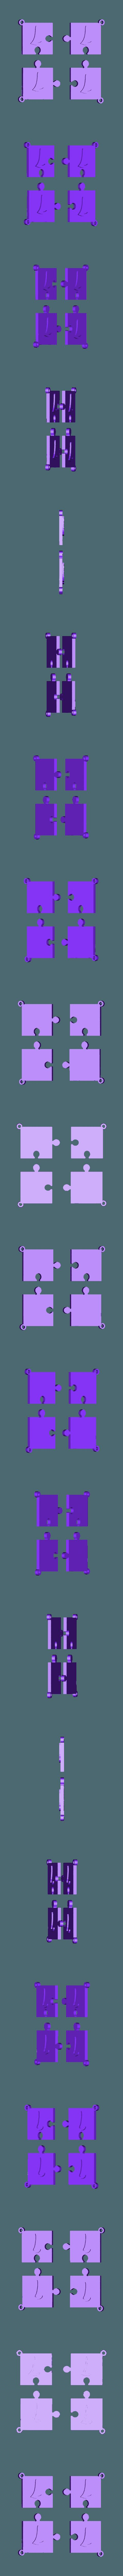 puzzle l.stl Download STL file puzzle key ring • 3D printing design, catf3d